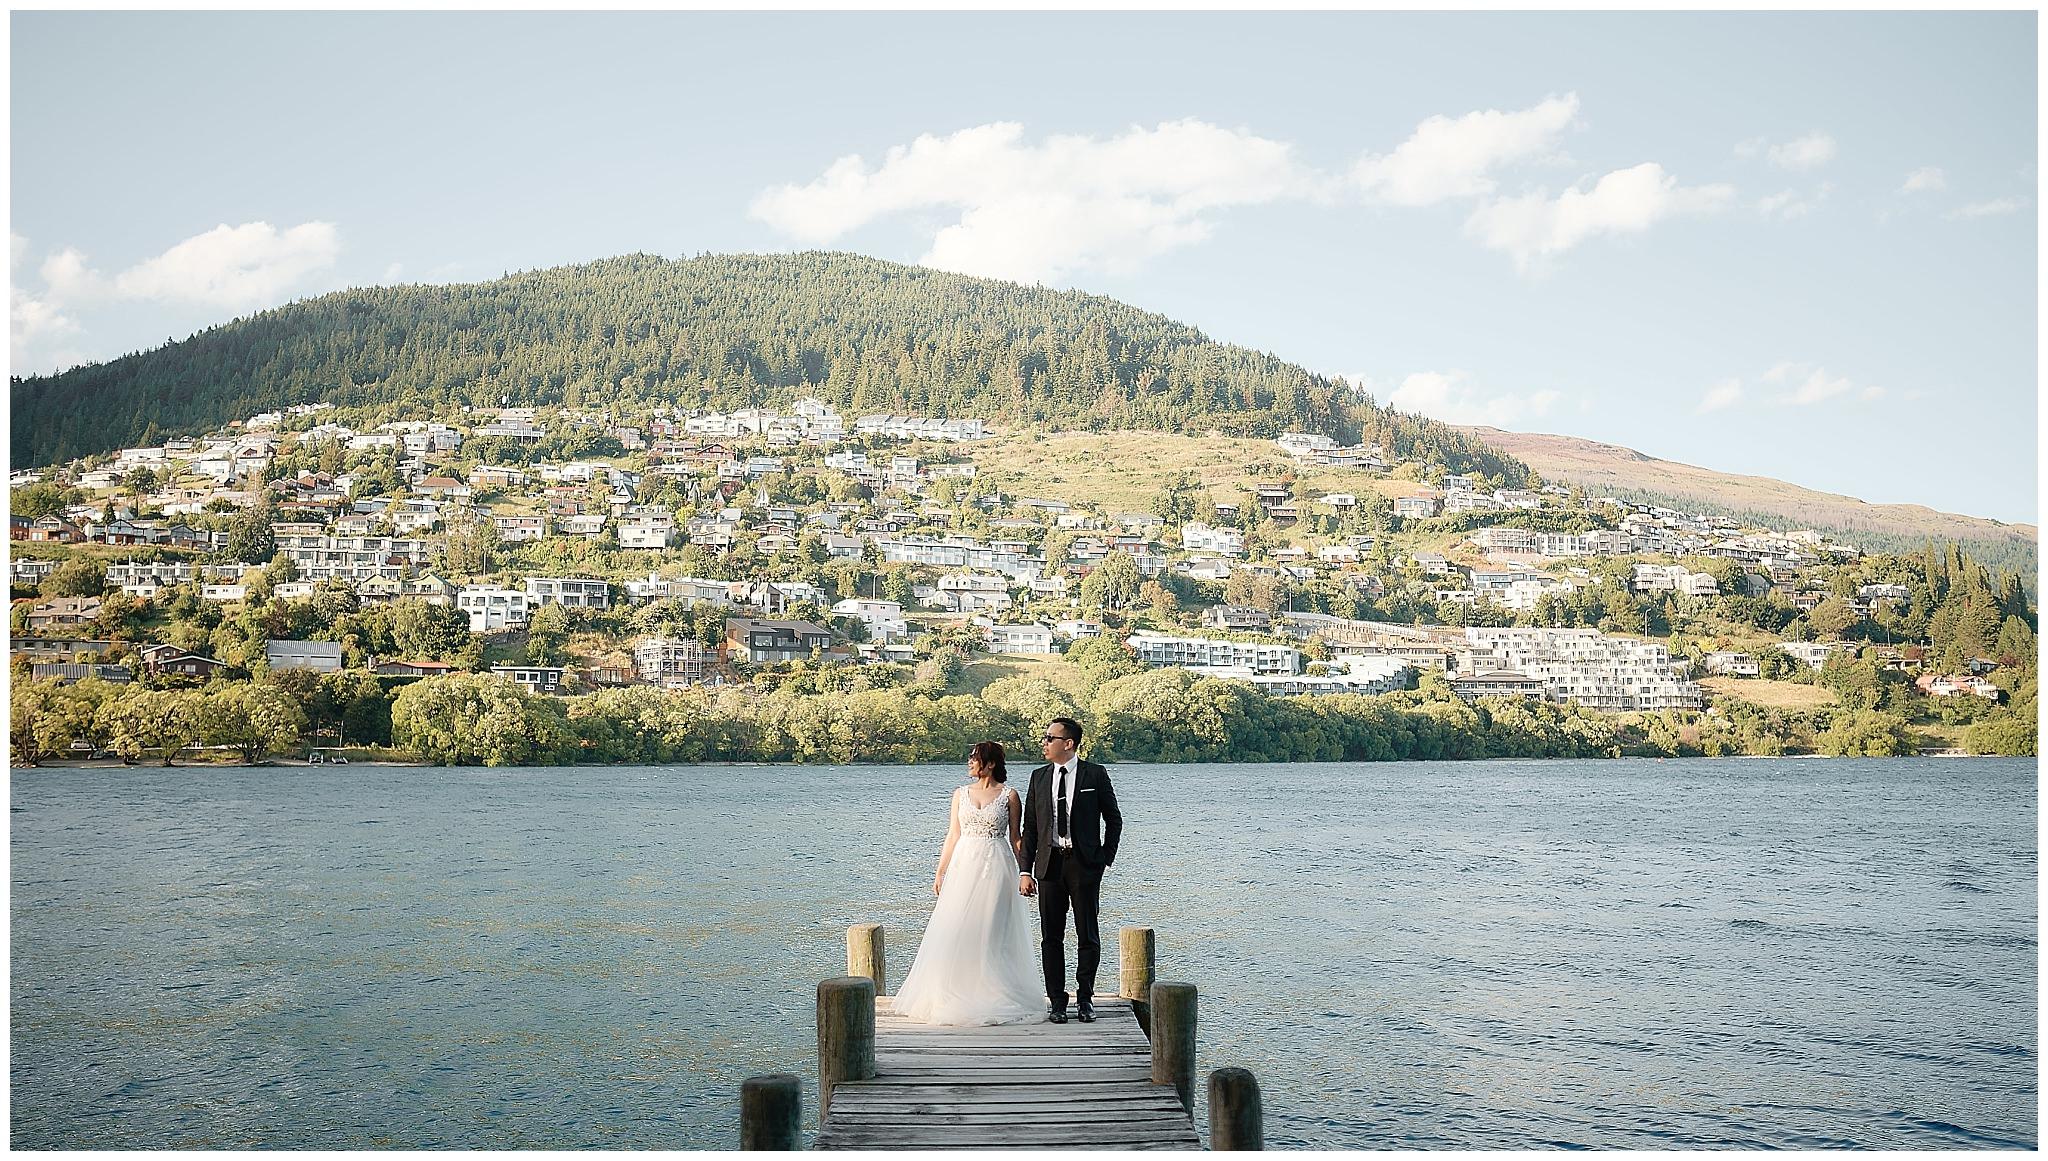 Queenstown New Zealand Prewedding Photographer_0068.jpg